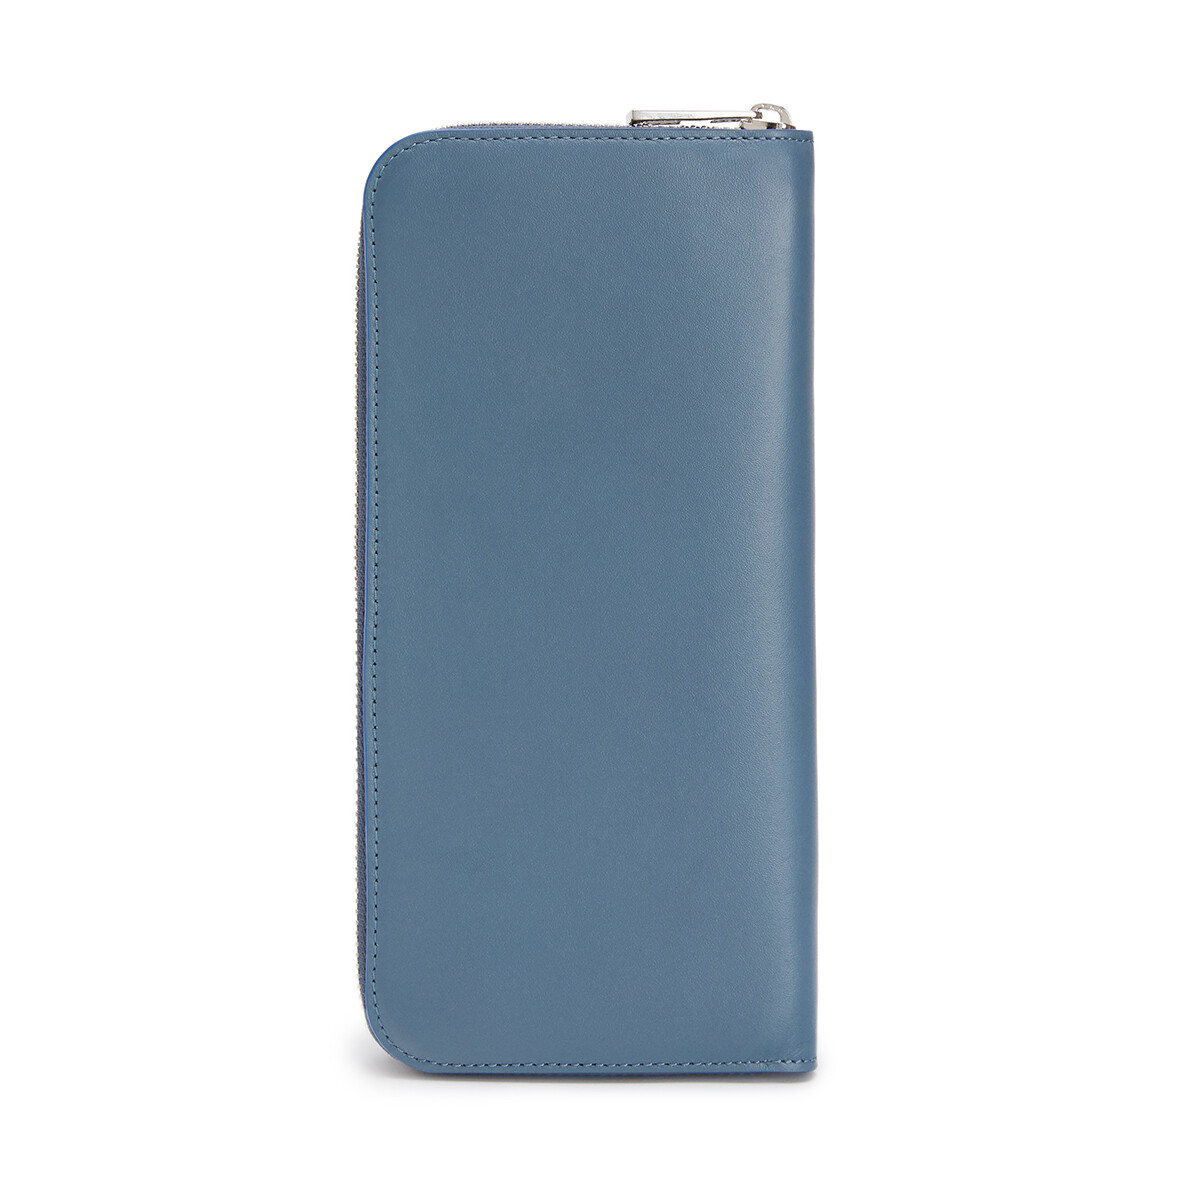 LOEWE Brand Open Wallet Steel Blue front